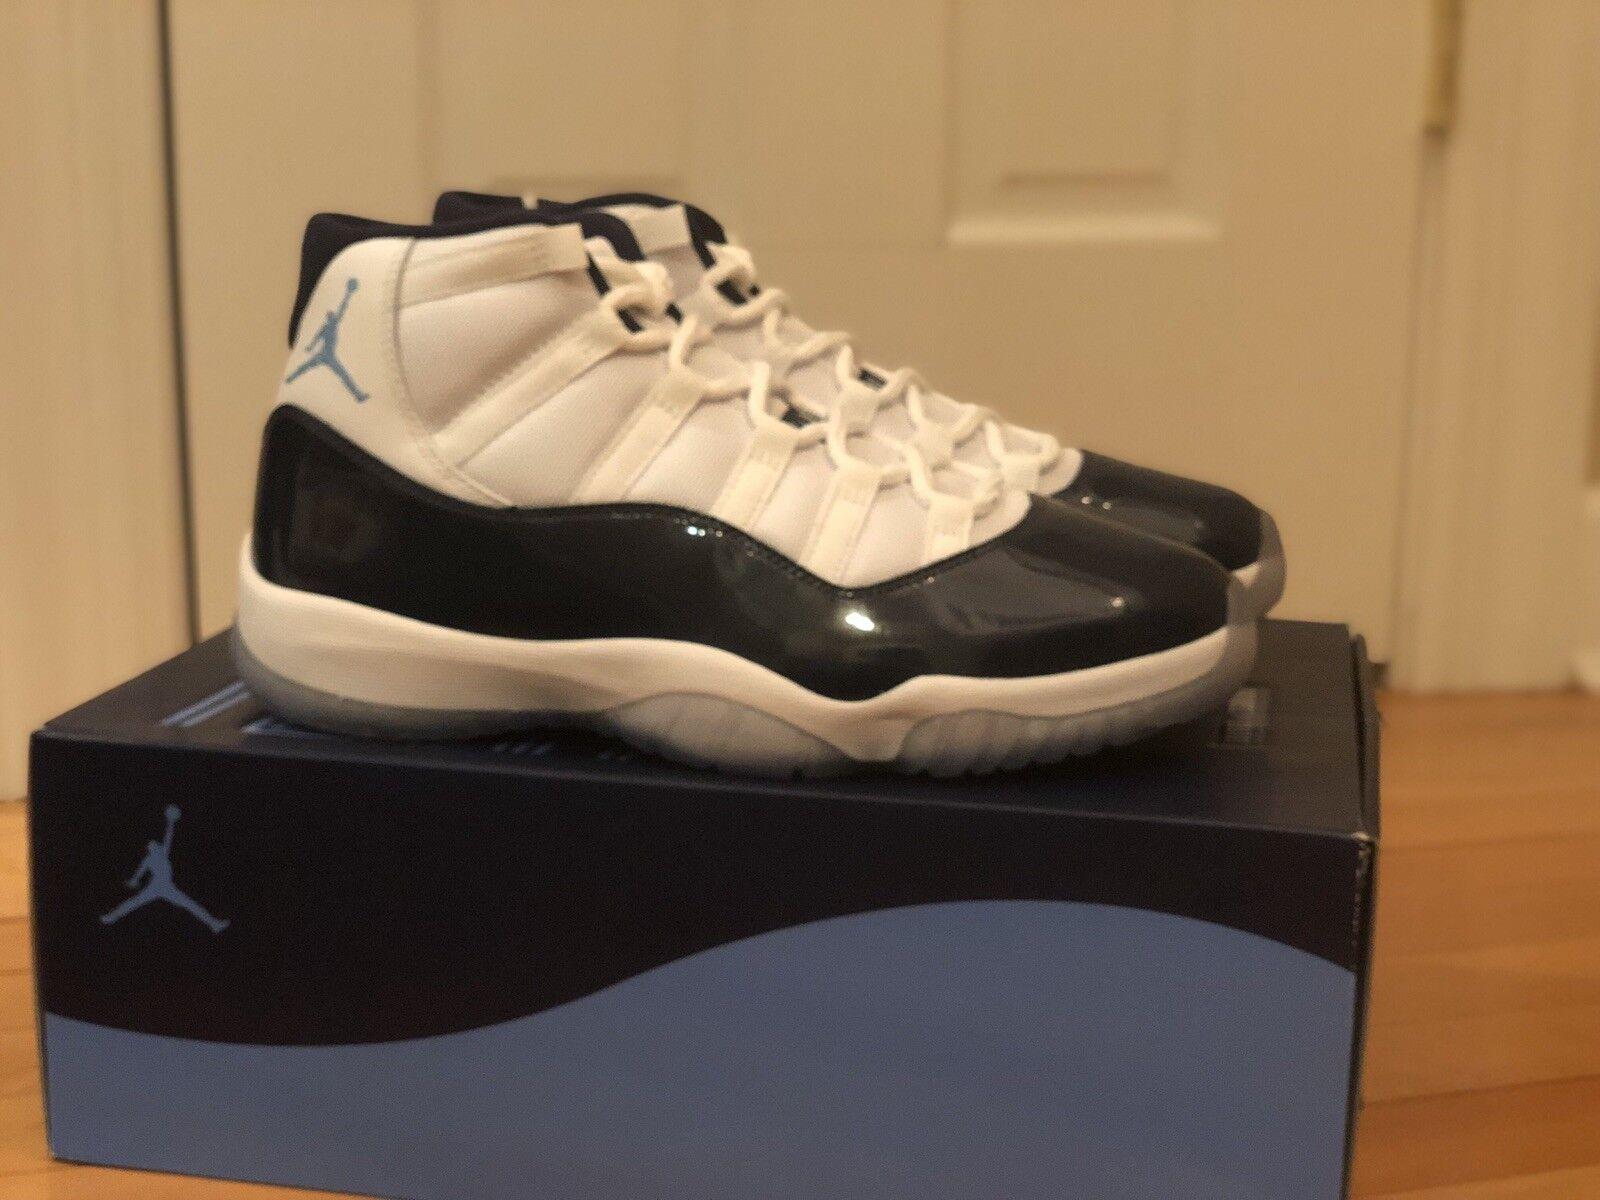 Air Jordan 11 Win Like 82 Size 10.5 XI Retro Midnight Navy bluee White 378037 123